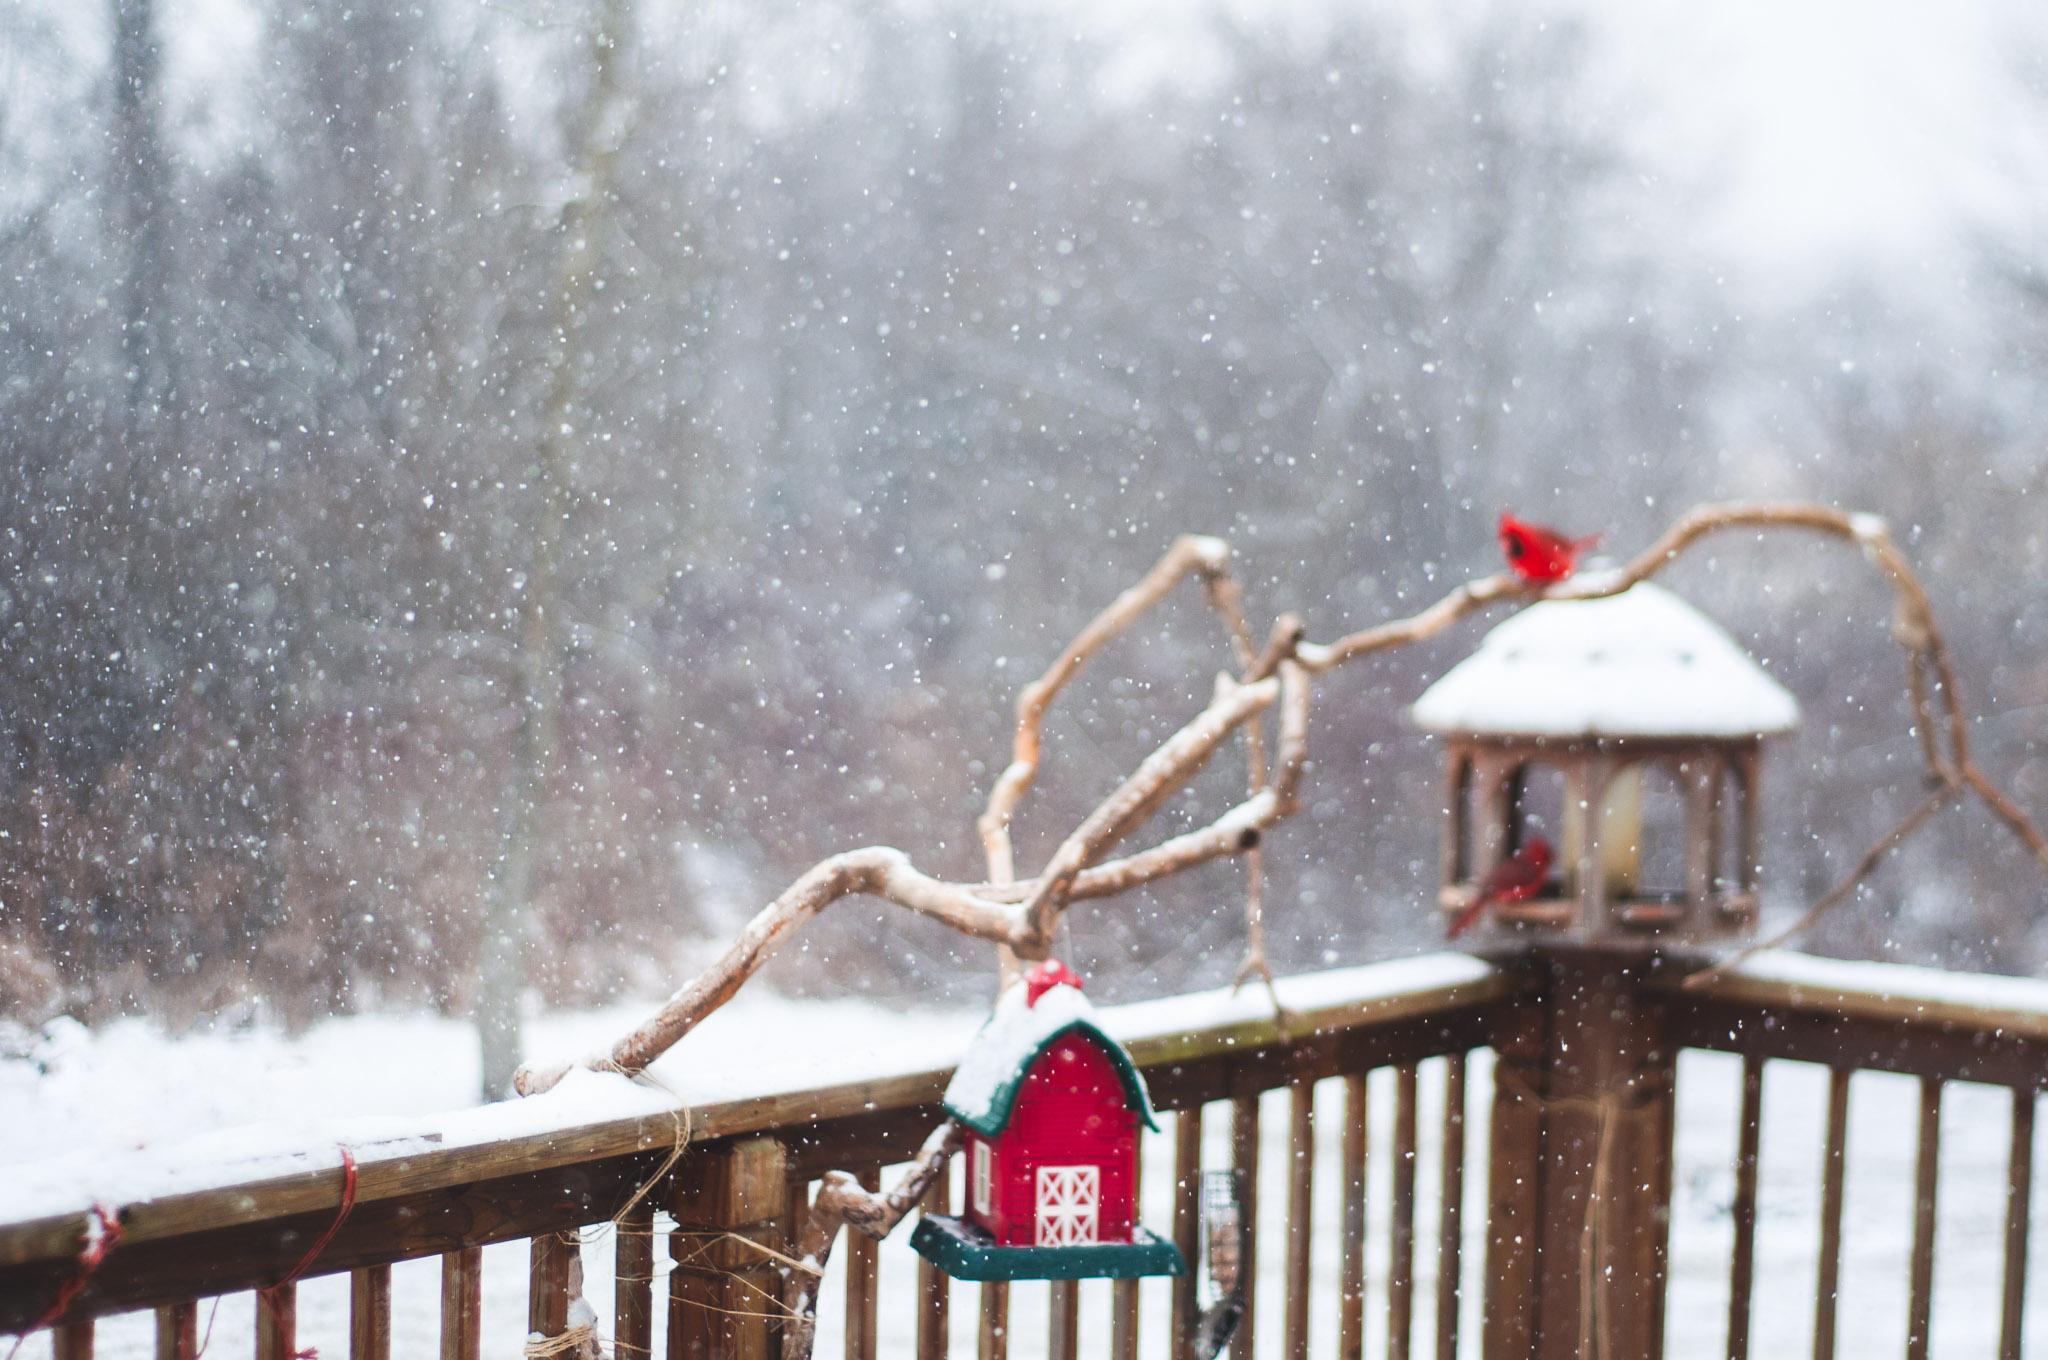 Cardinals {Freelensed}